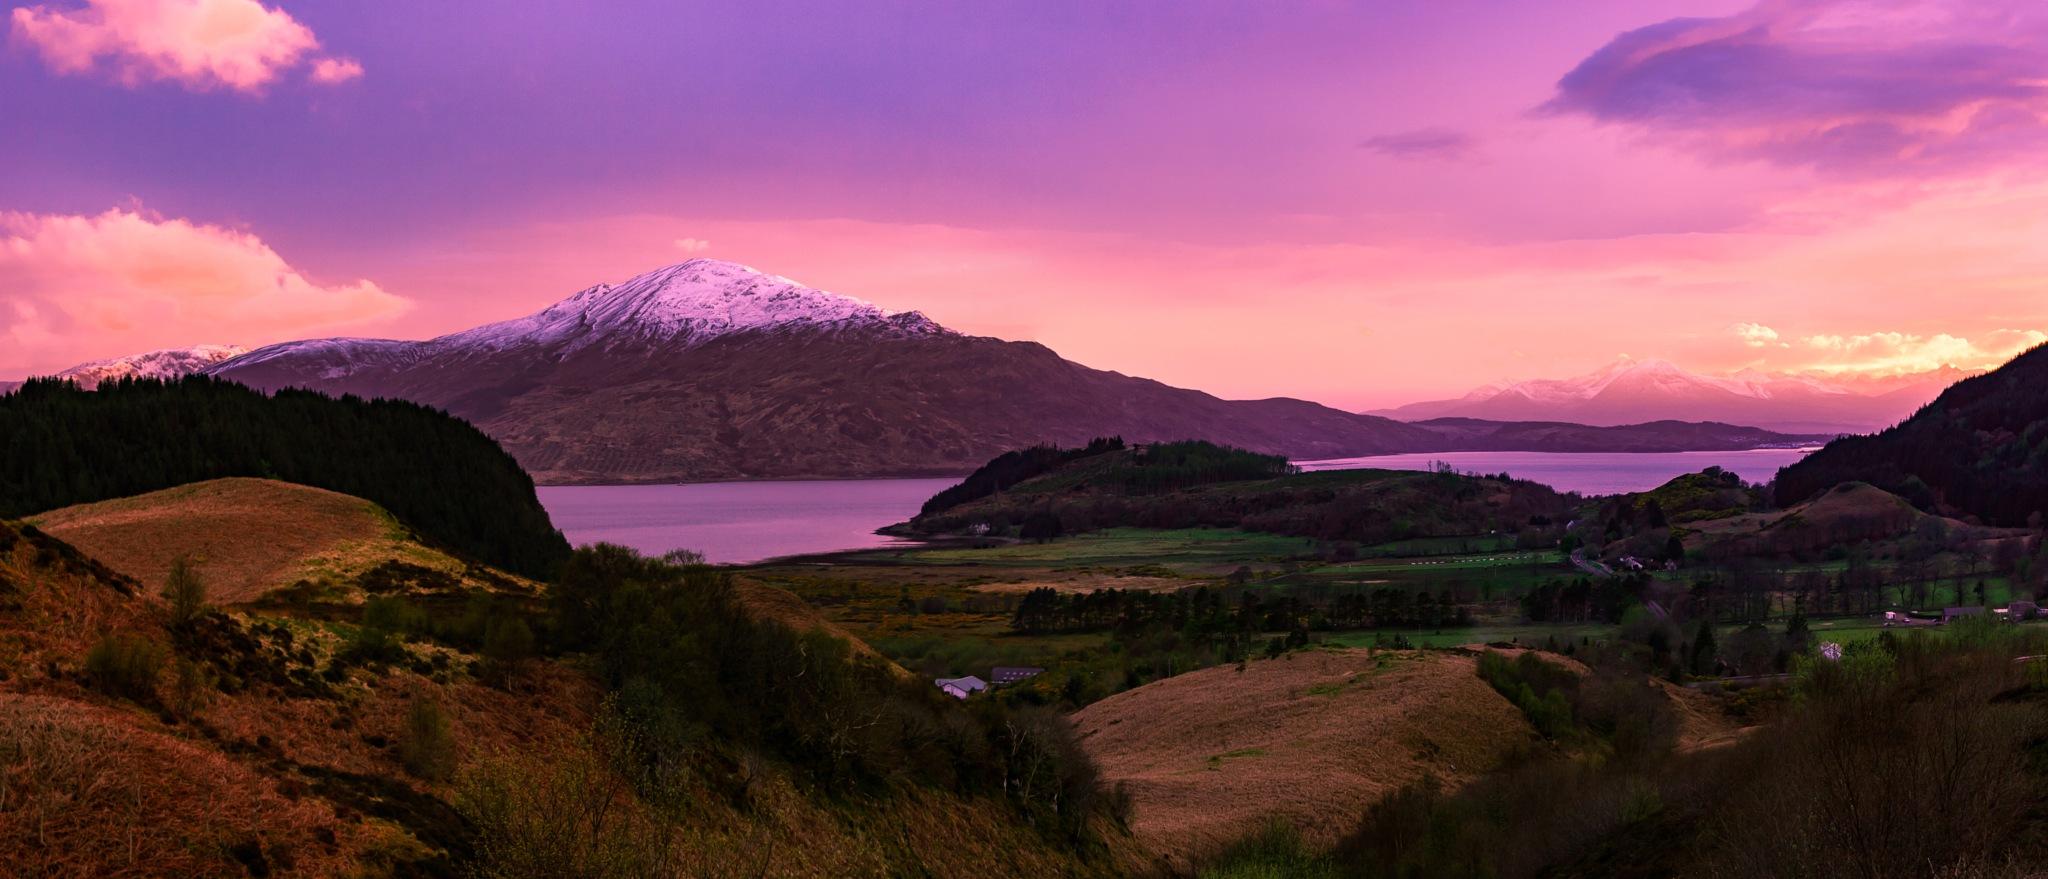 Sunset over Isle of Skye by M i c k e _ H o l m b e r g _ P h o t o g r a p h y